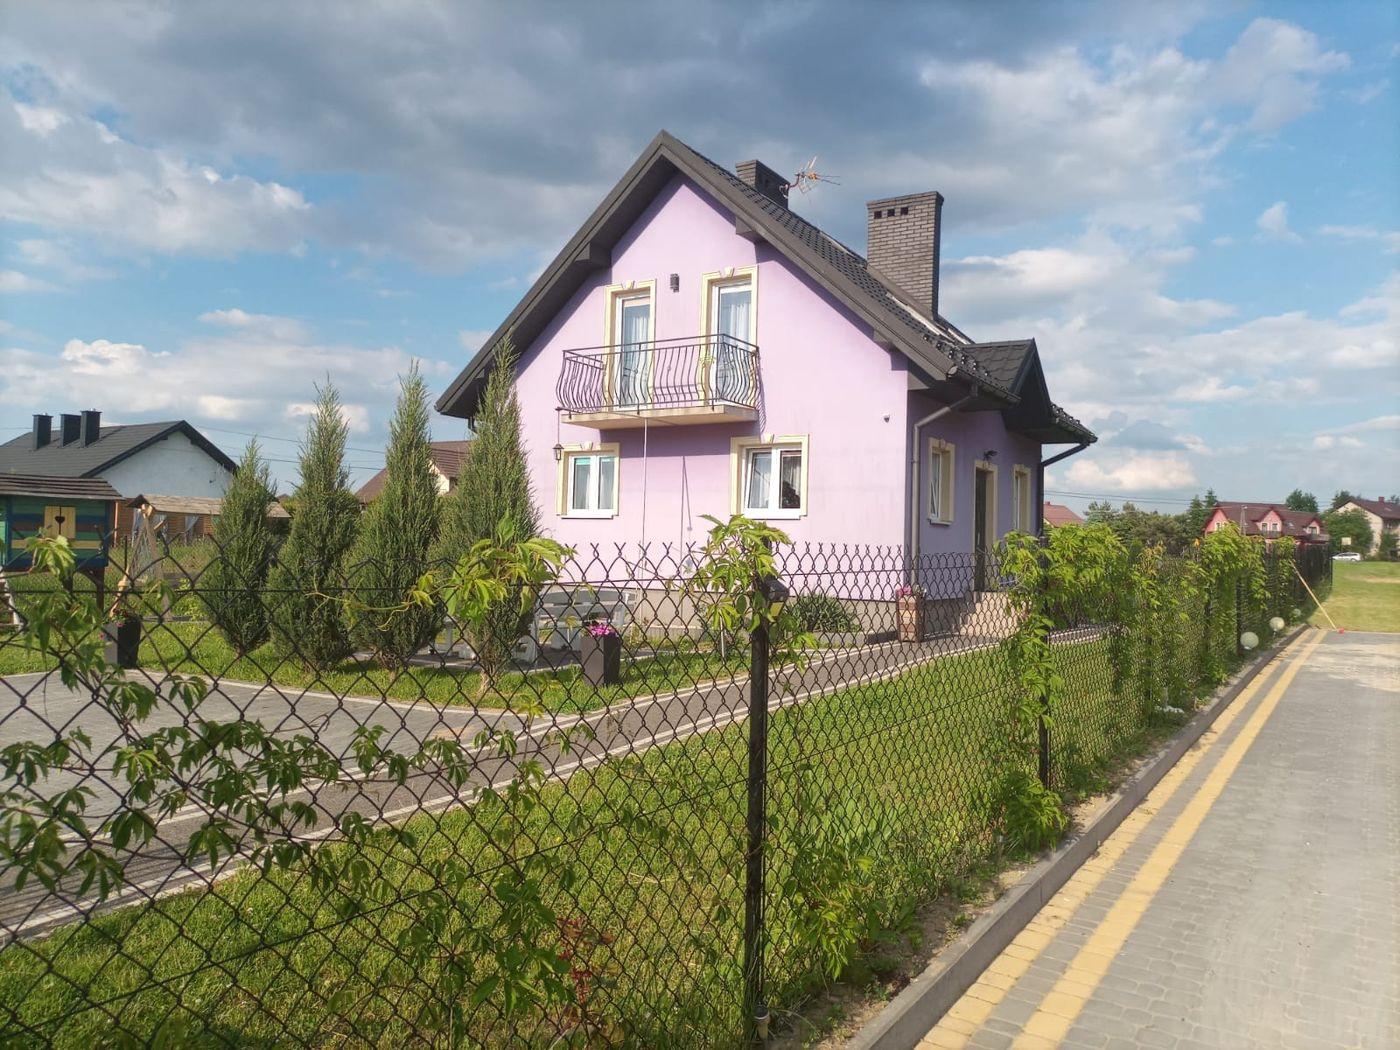 jagodowy-domek-lato_9